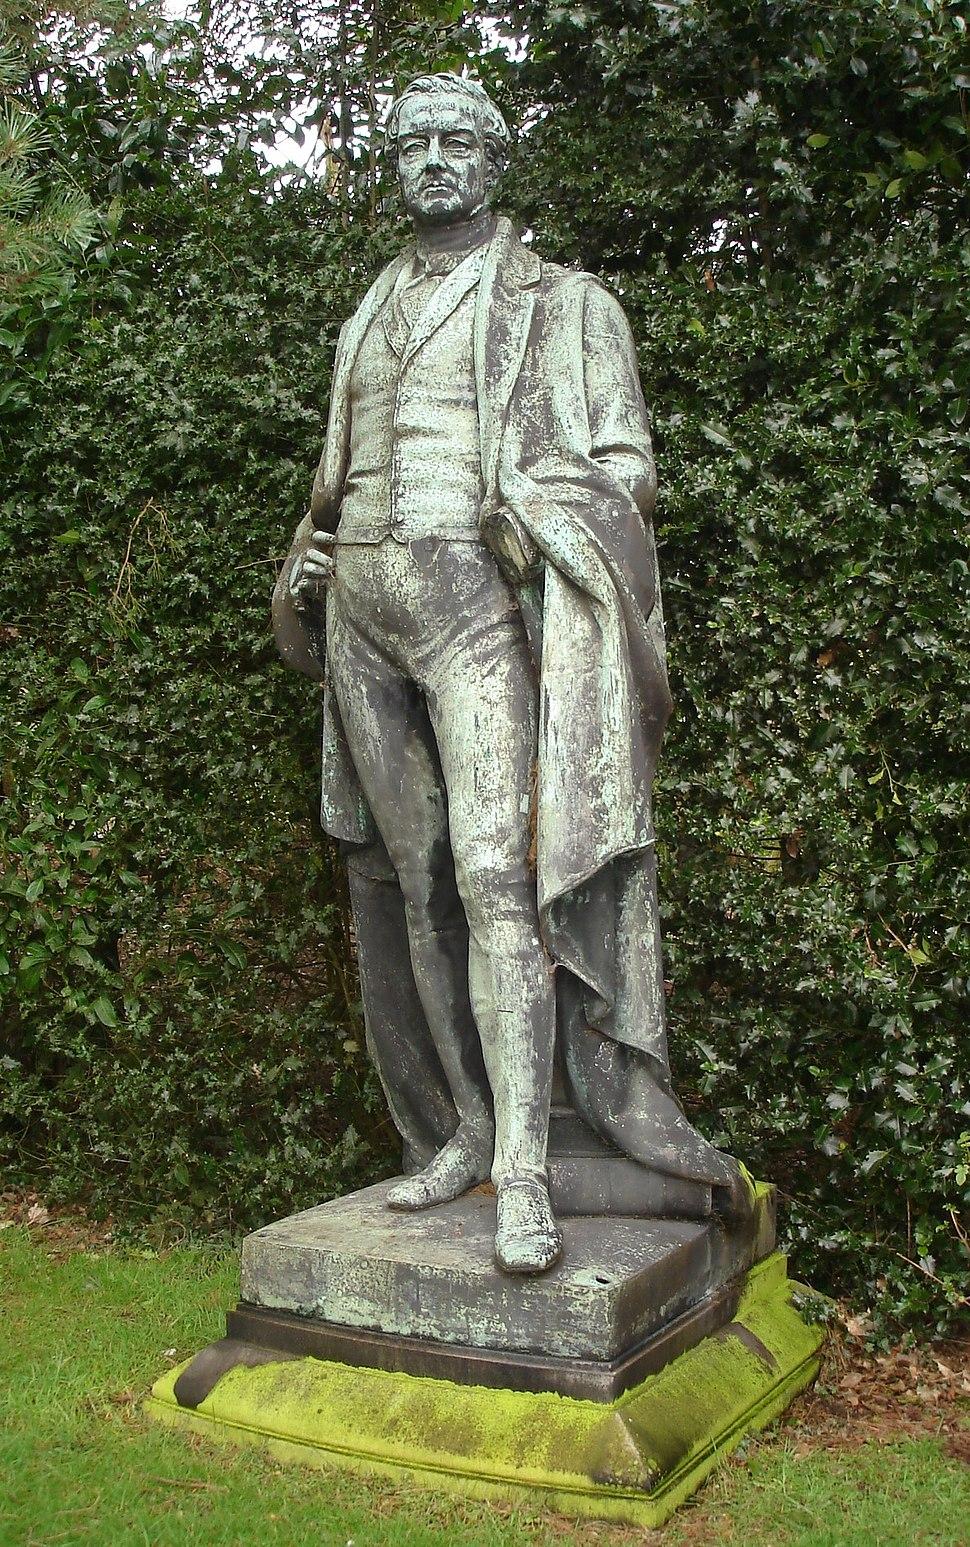 Sir Robert Peel, Gawsworth, East Cheshire